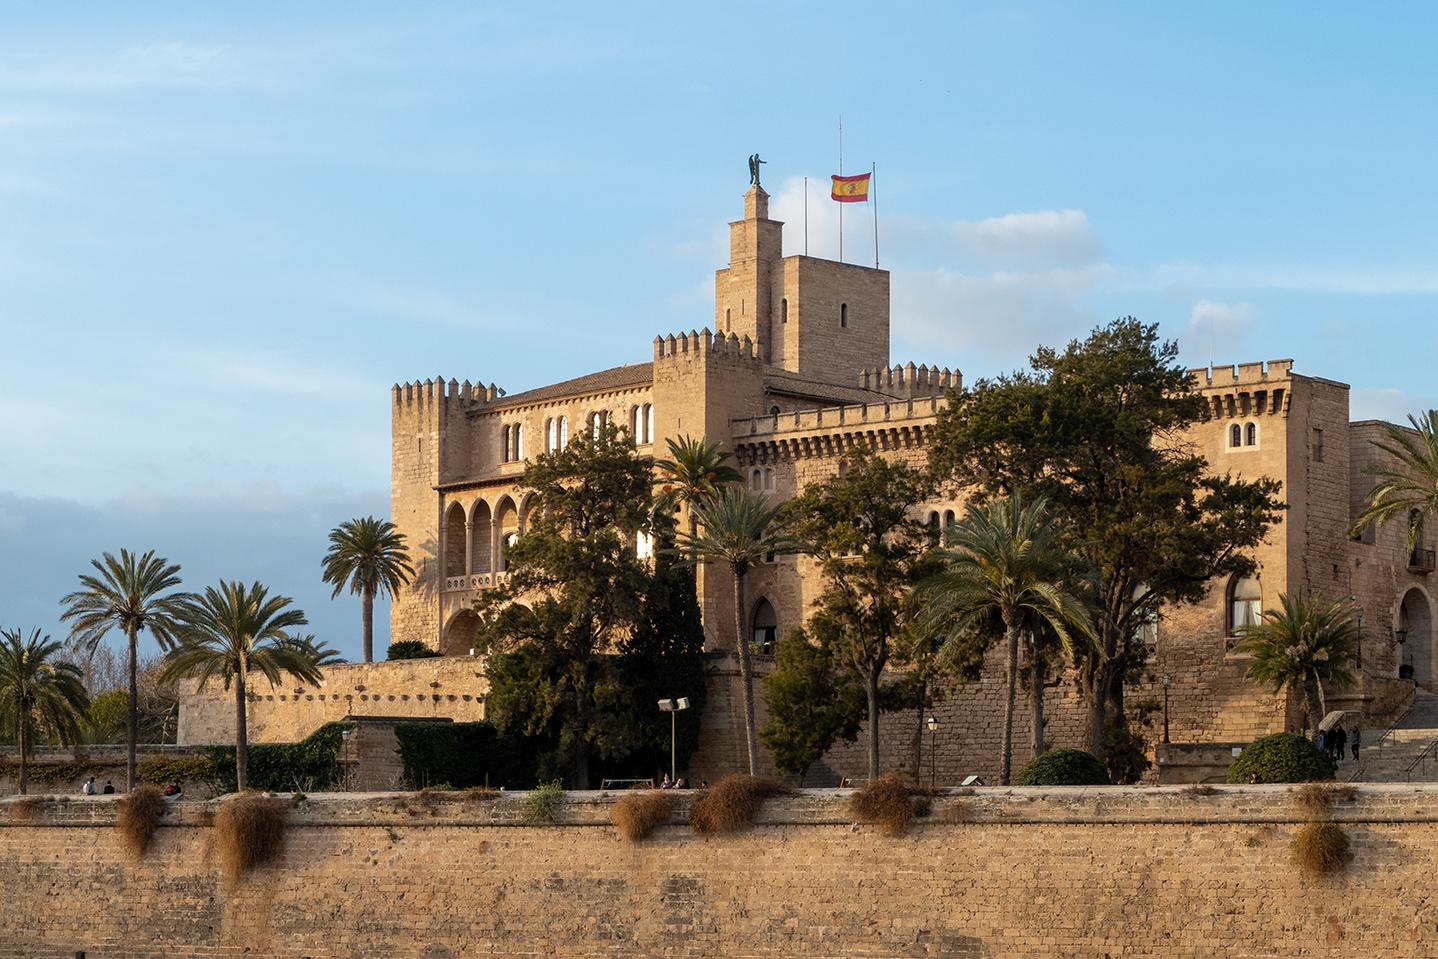 Palau Reial de L'Almudaina, Palma de Mallorca, Spain